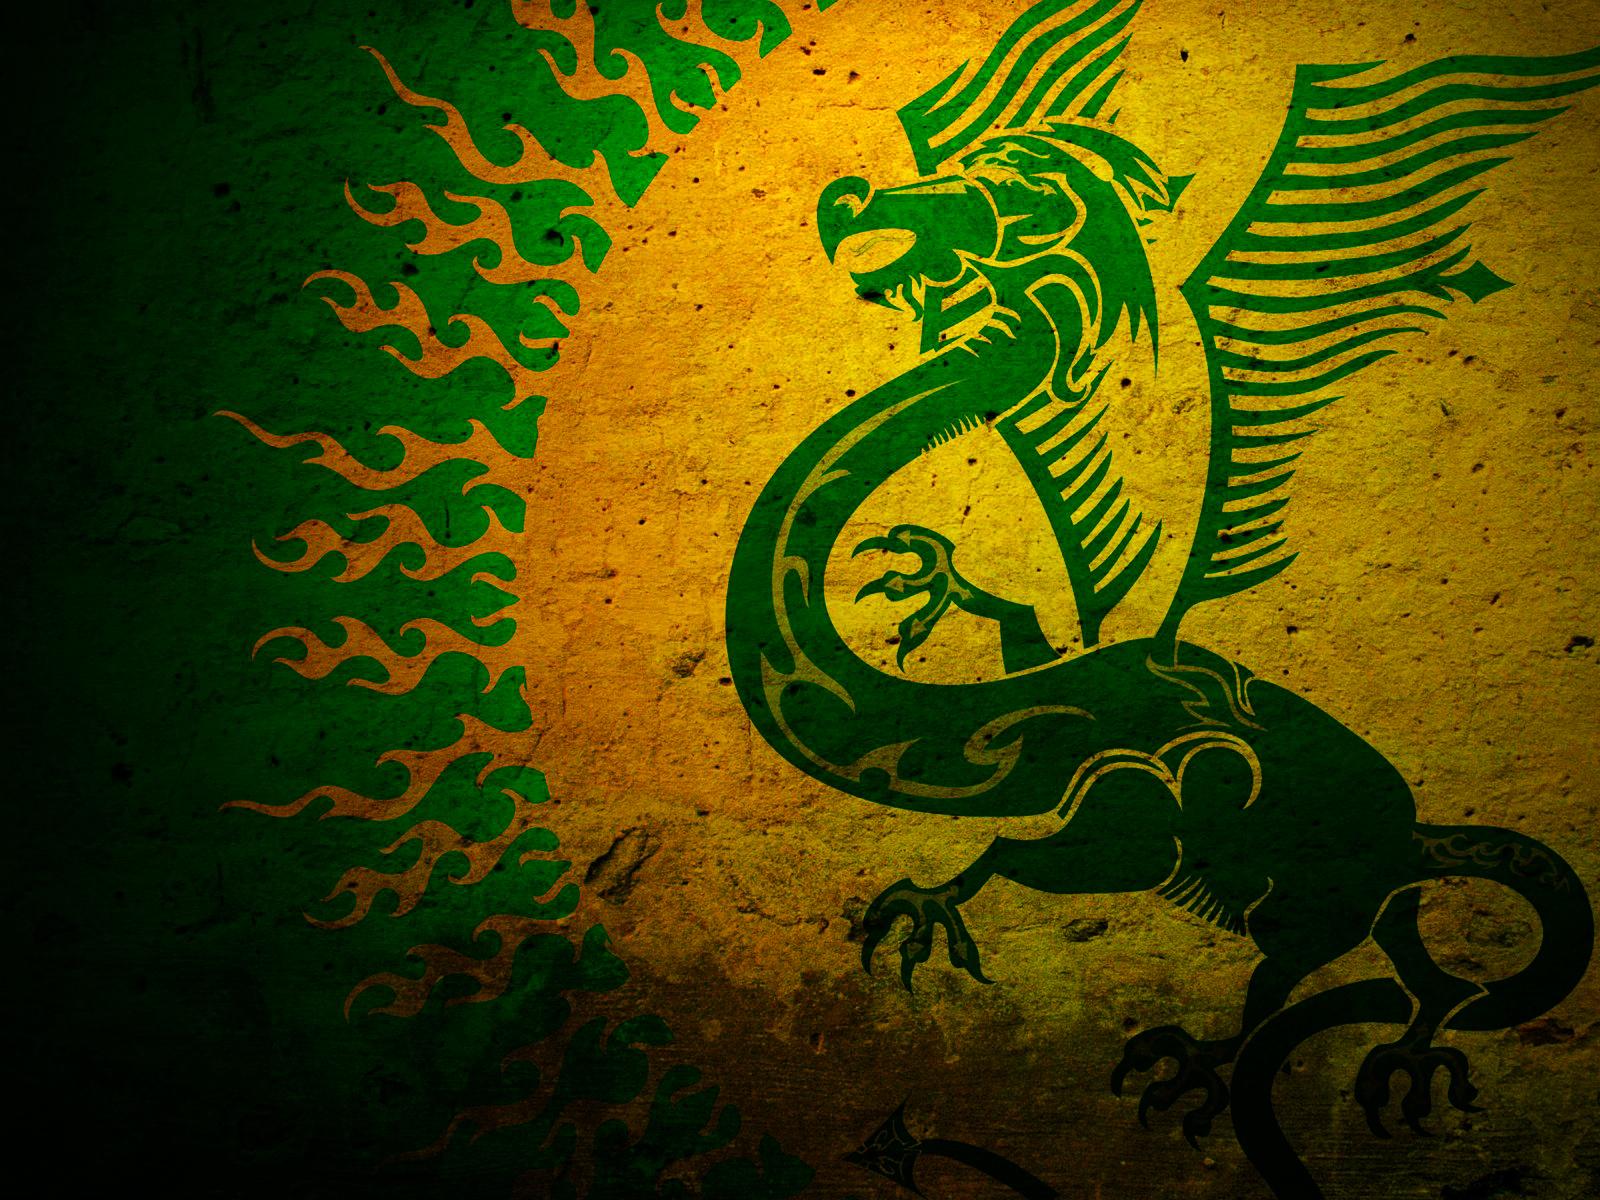 Green Dragon Symbol Wallpaper